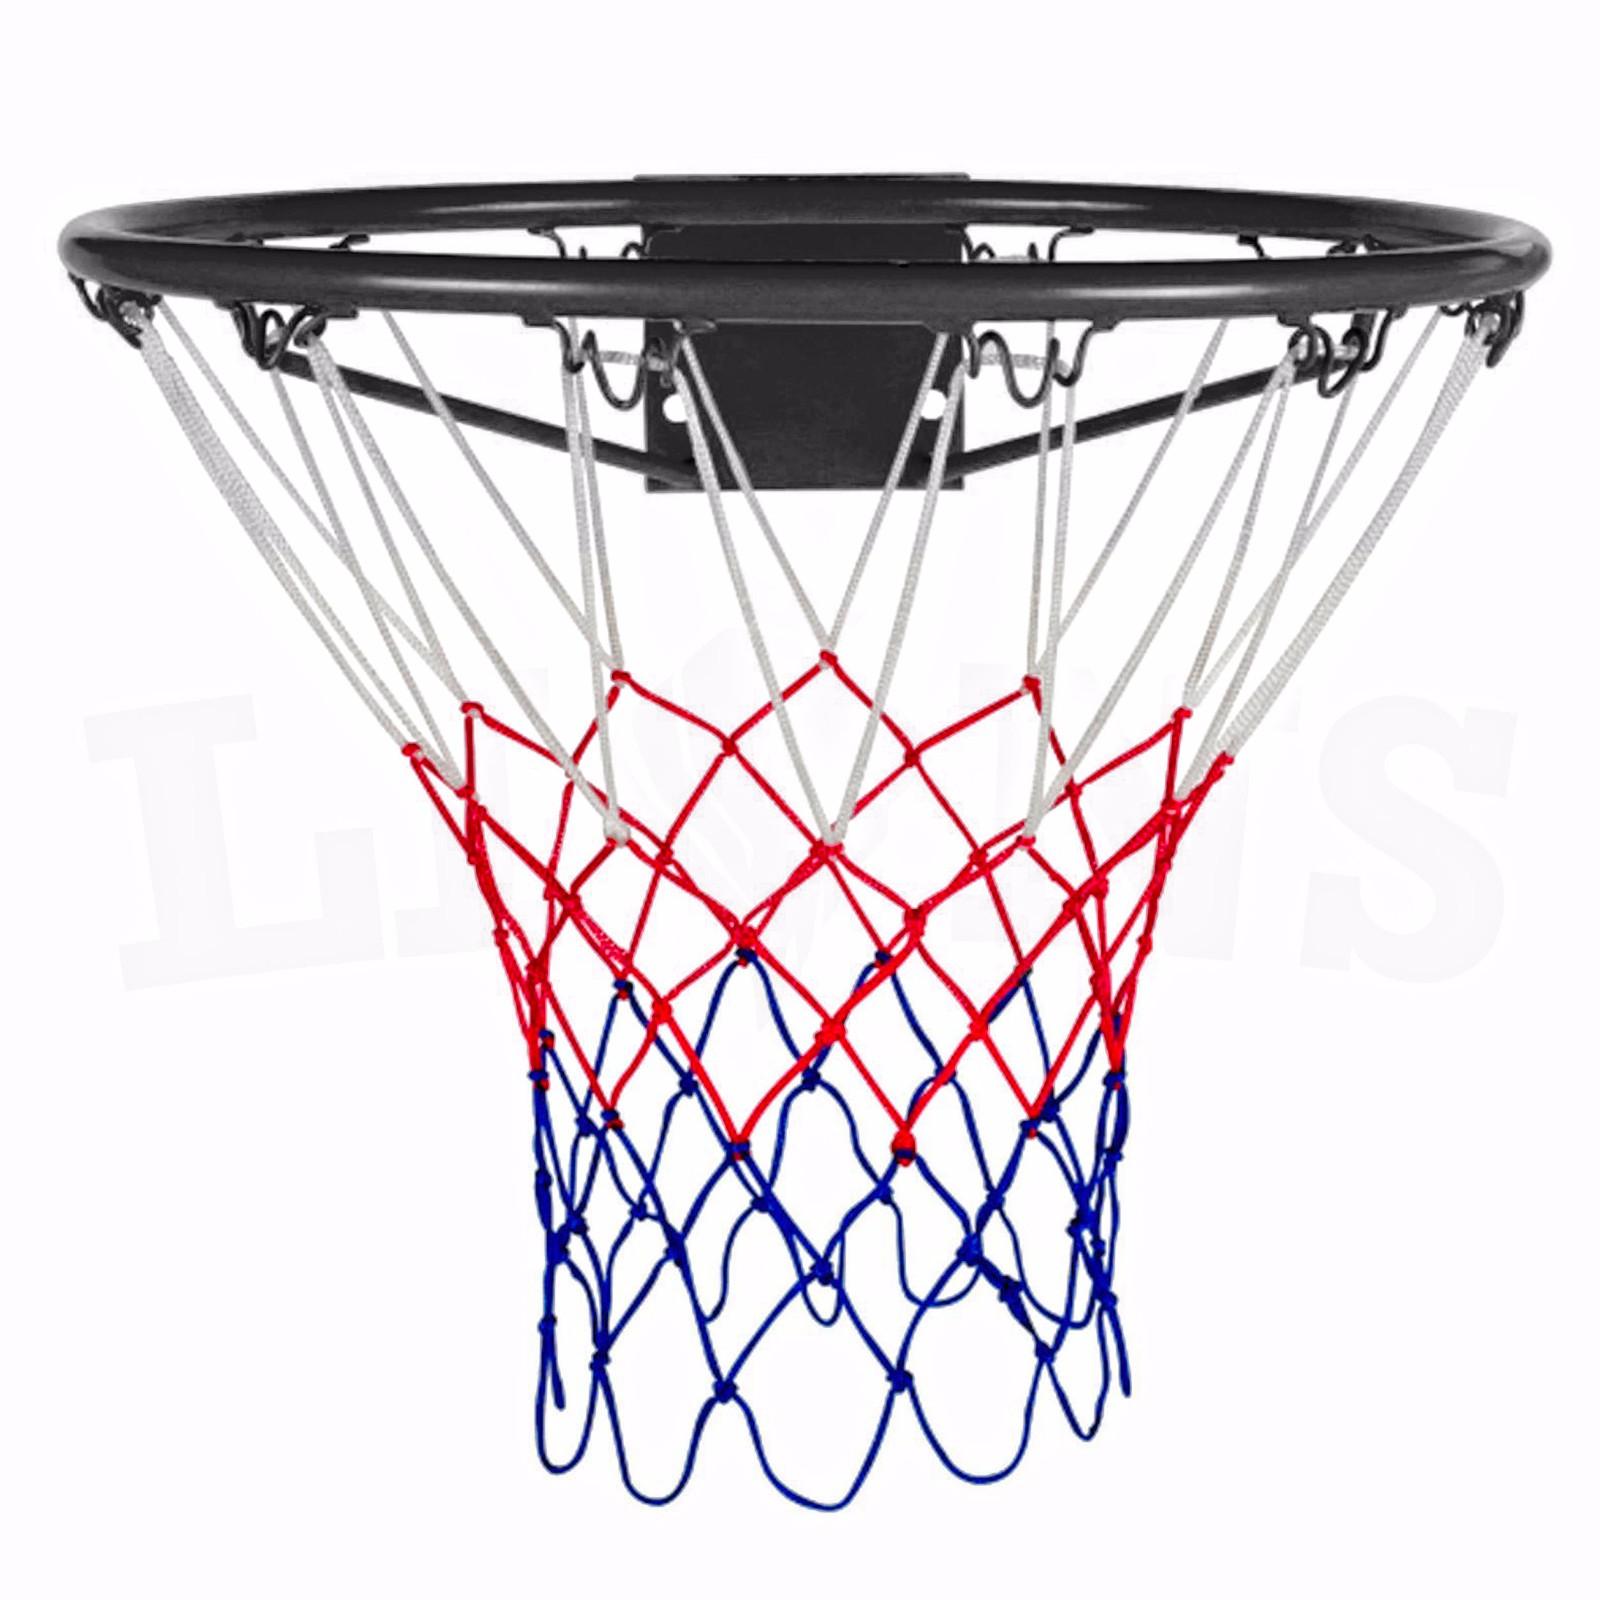 1600x1600 Basketball Hoop Ring Net Amp Wall Mounting Fixings Indoor Outdoor